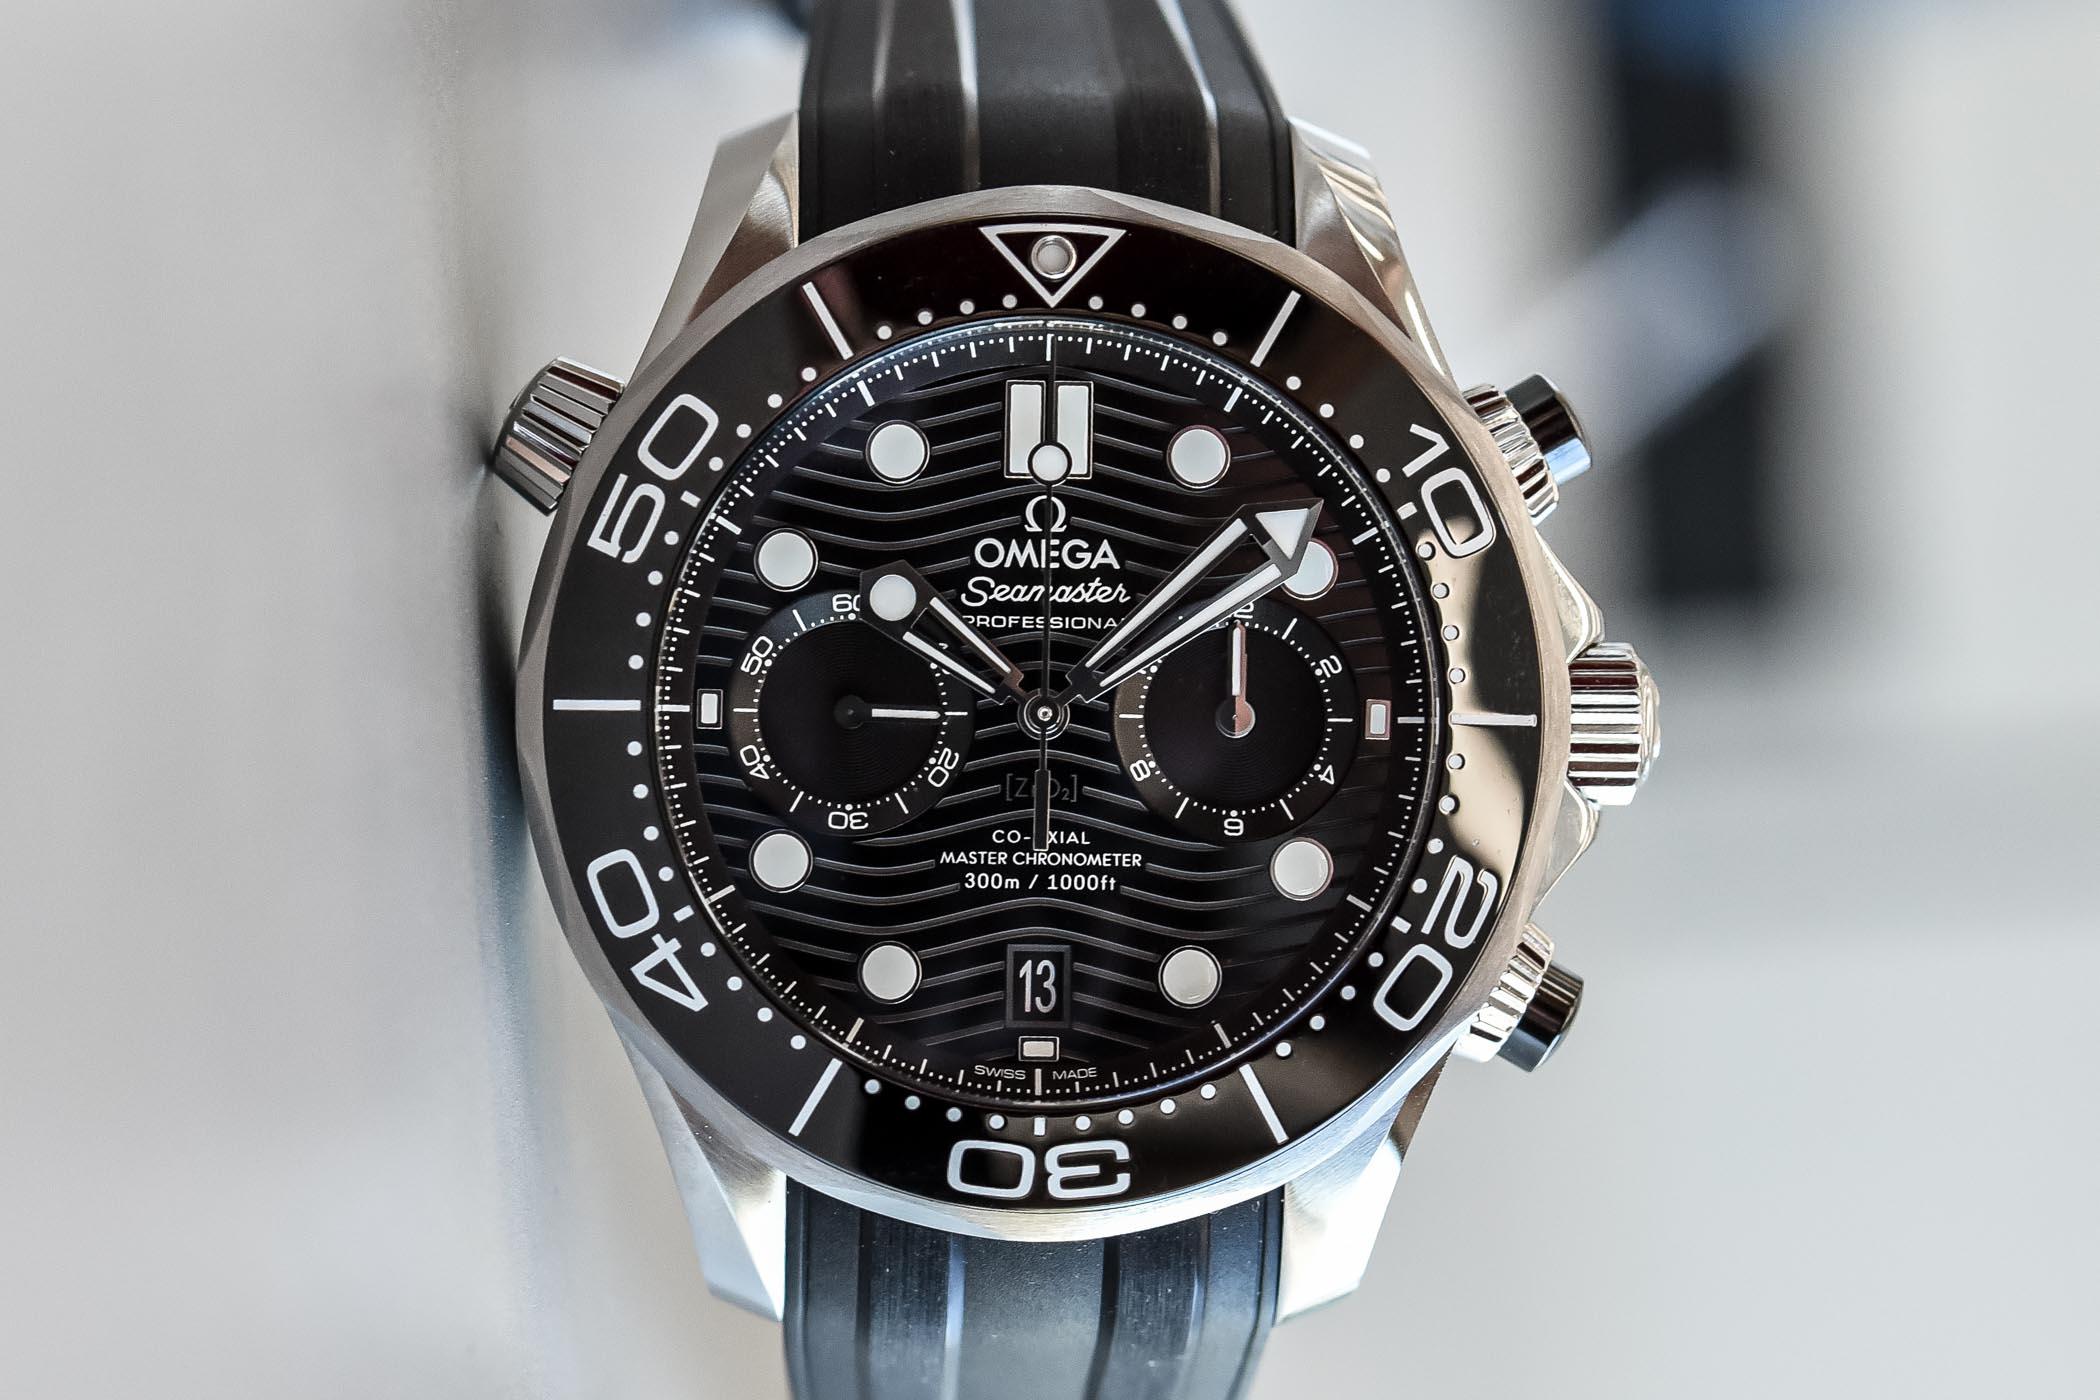 omega seamaster adventurer 300m chronograph